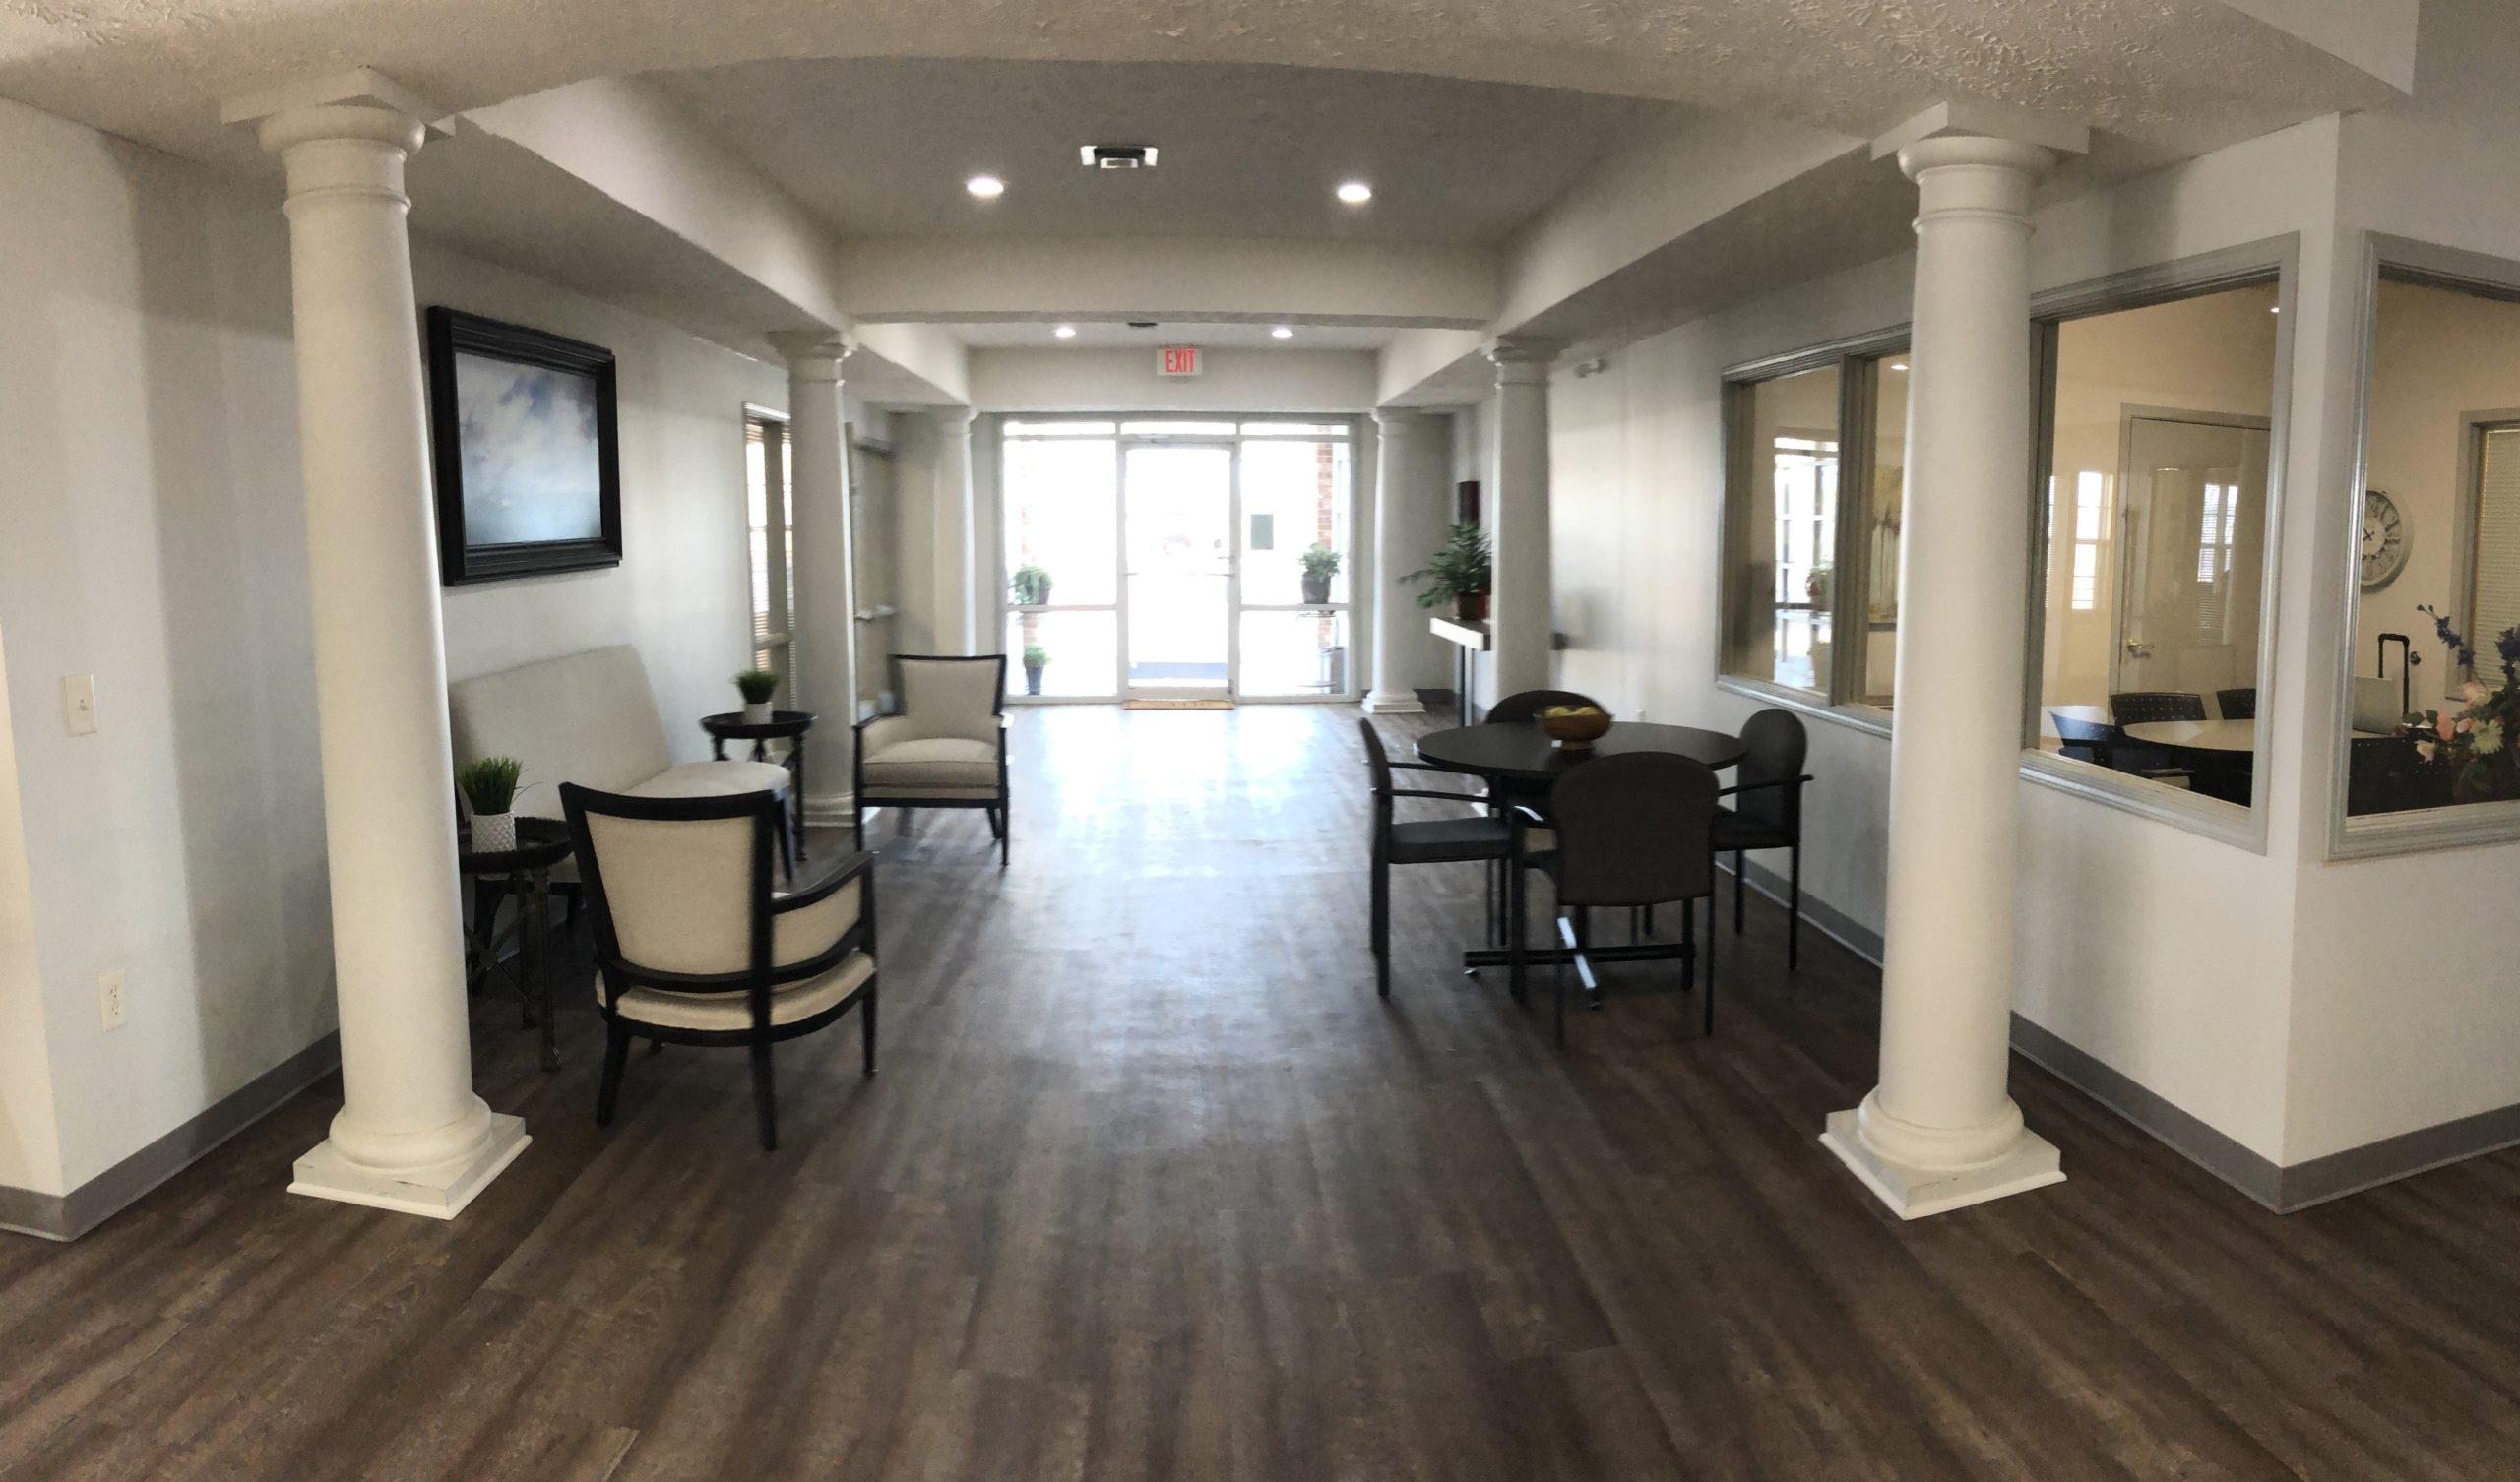 Tregaron Senior Residence Bellevue Nebraka lobby view 3